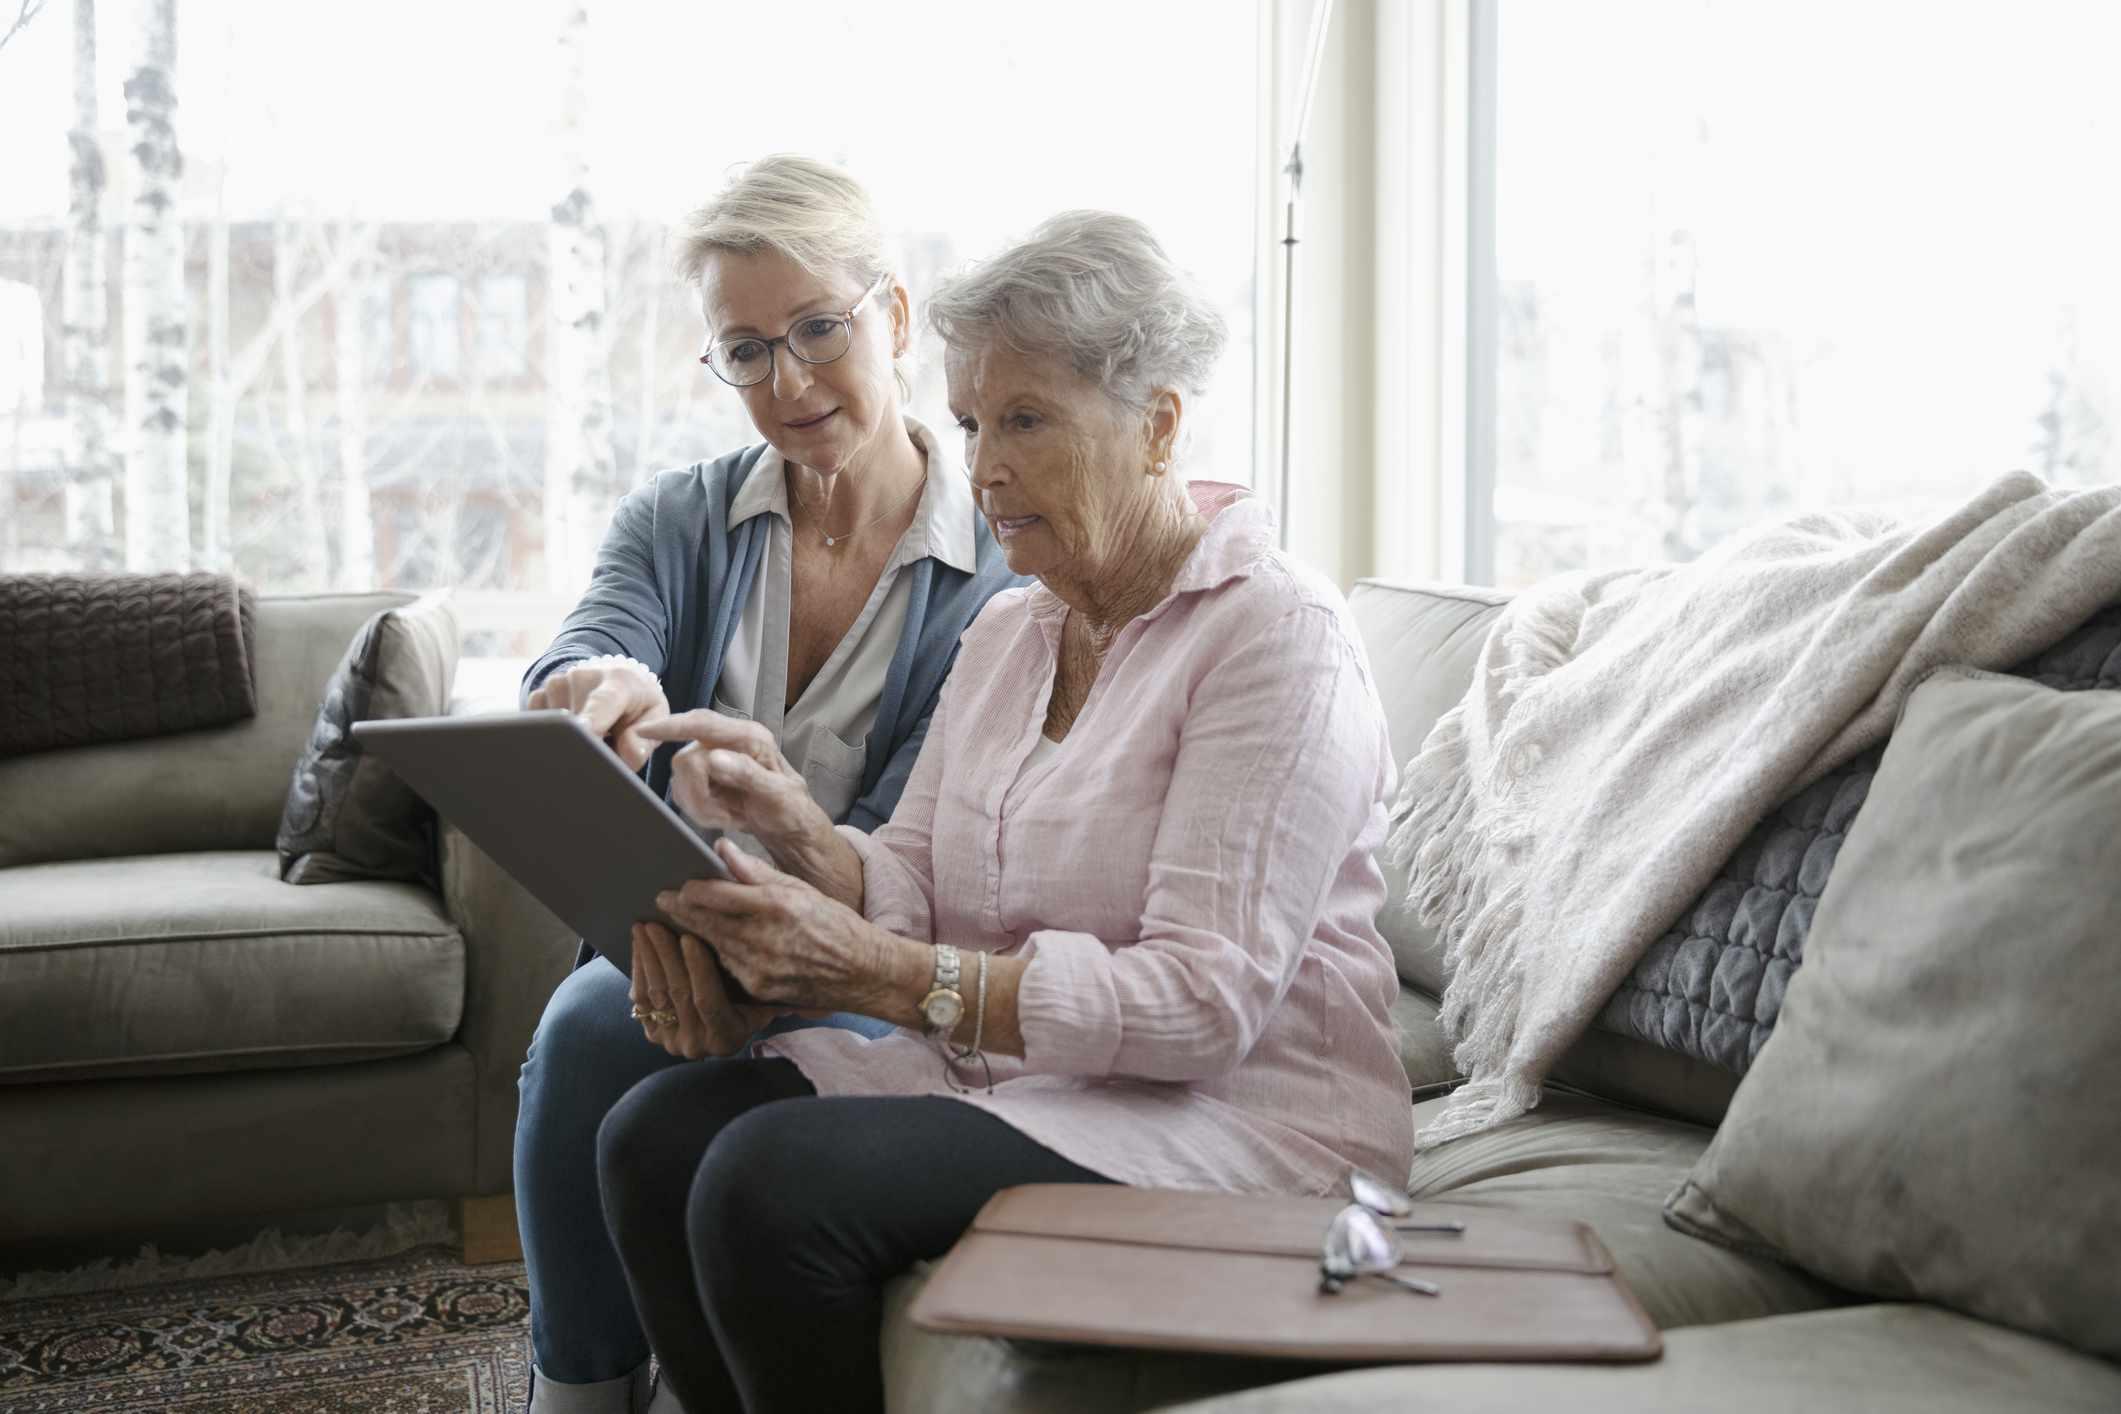 Daughter helping older mother using digital tablet in living room